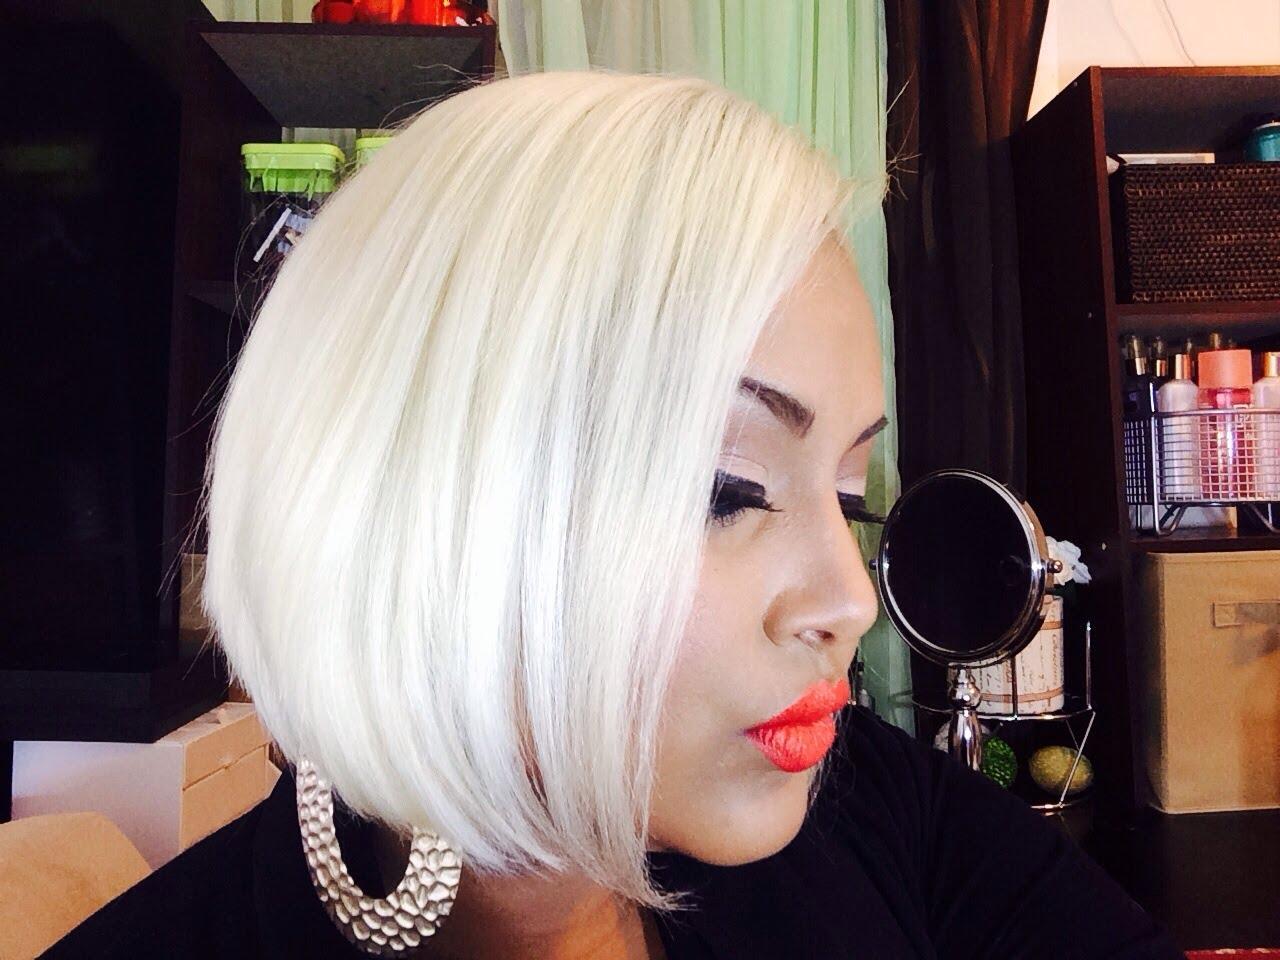 Platinum Blonde Hair 20 Ways To Satisfy Your Whimsical Tastes